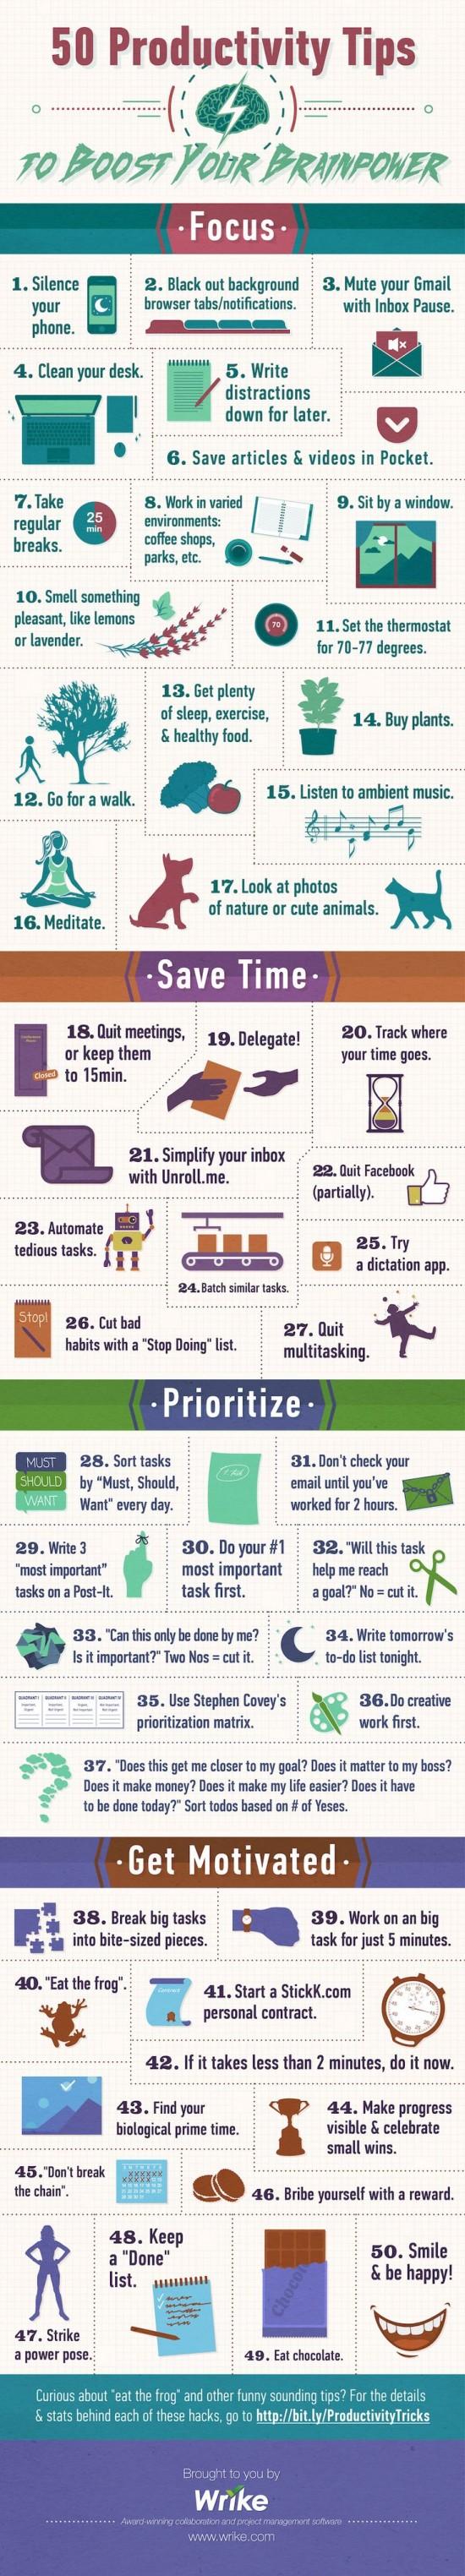 produktivita infografika